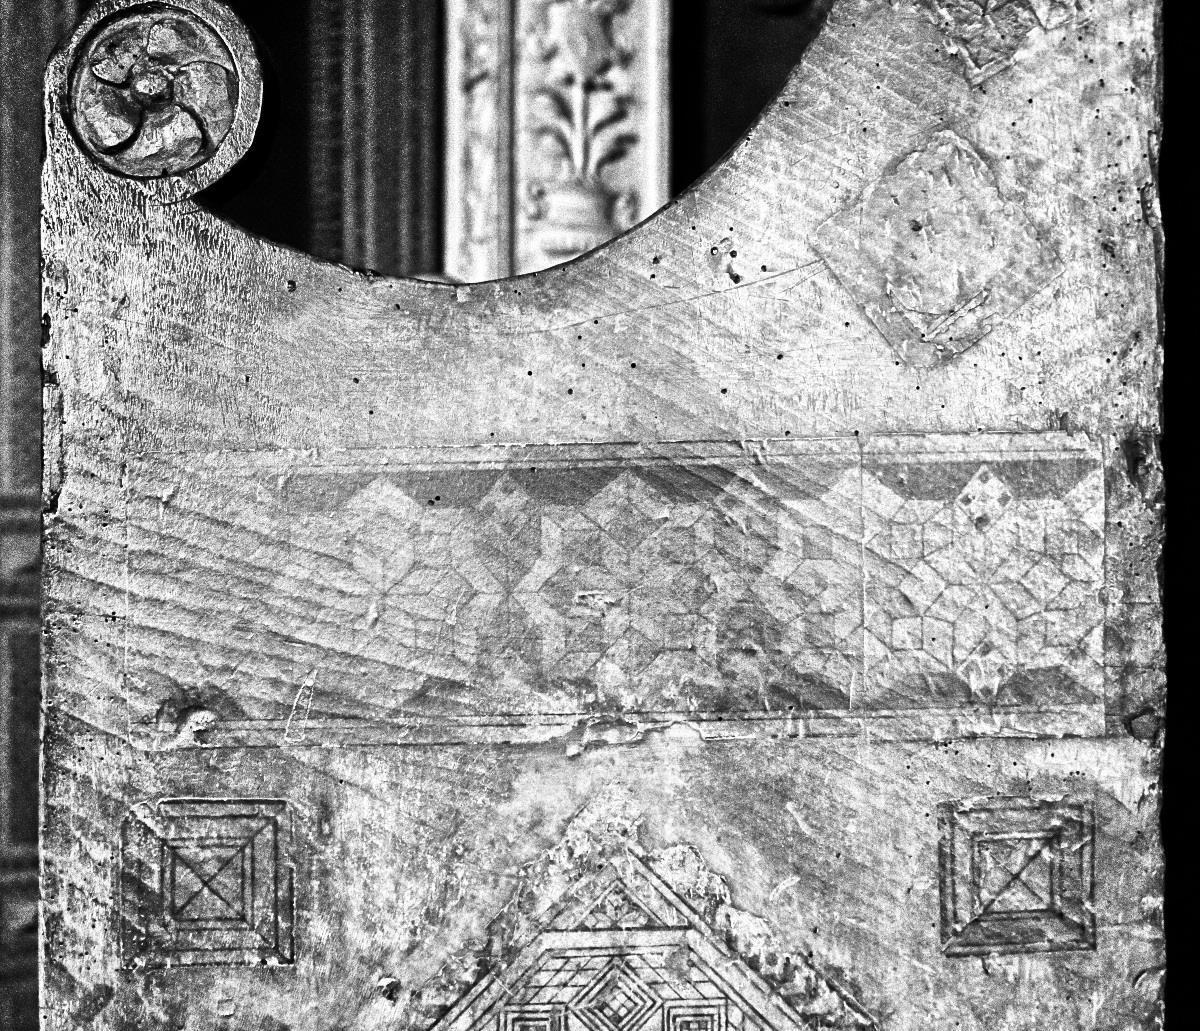 Decorazione geometrica su cattedra lignea